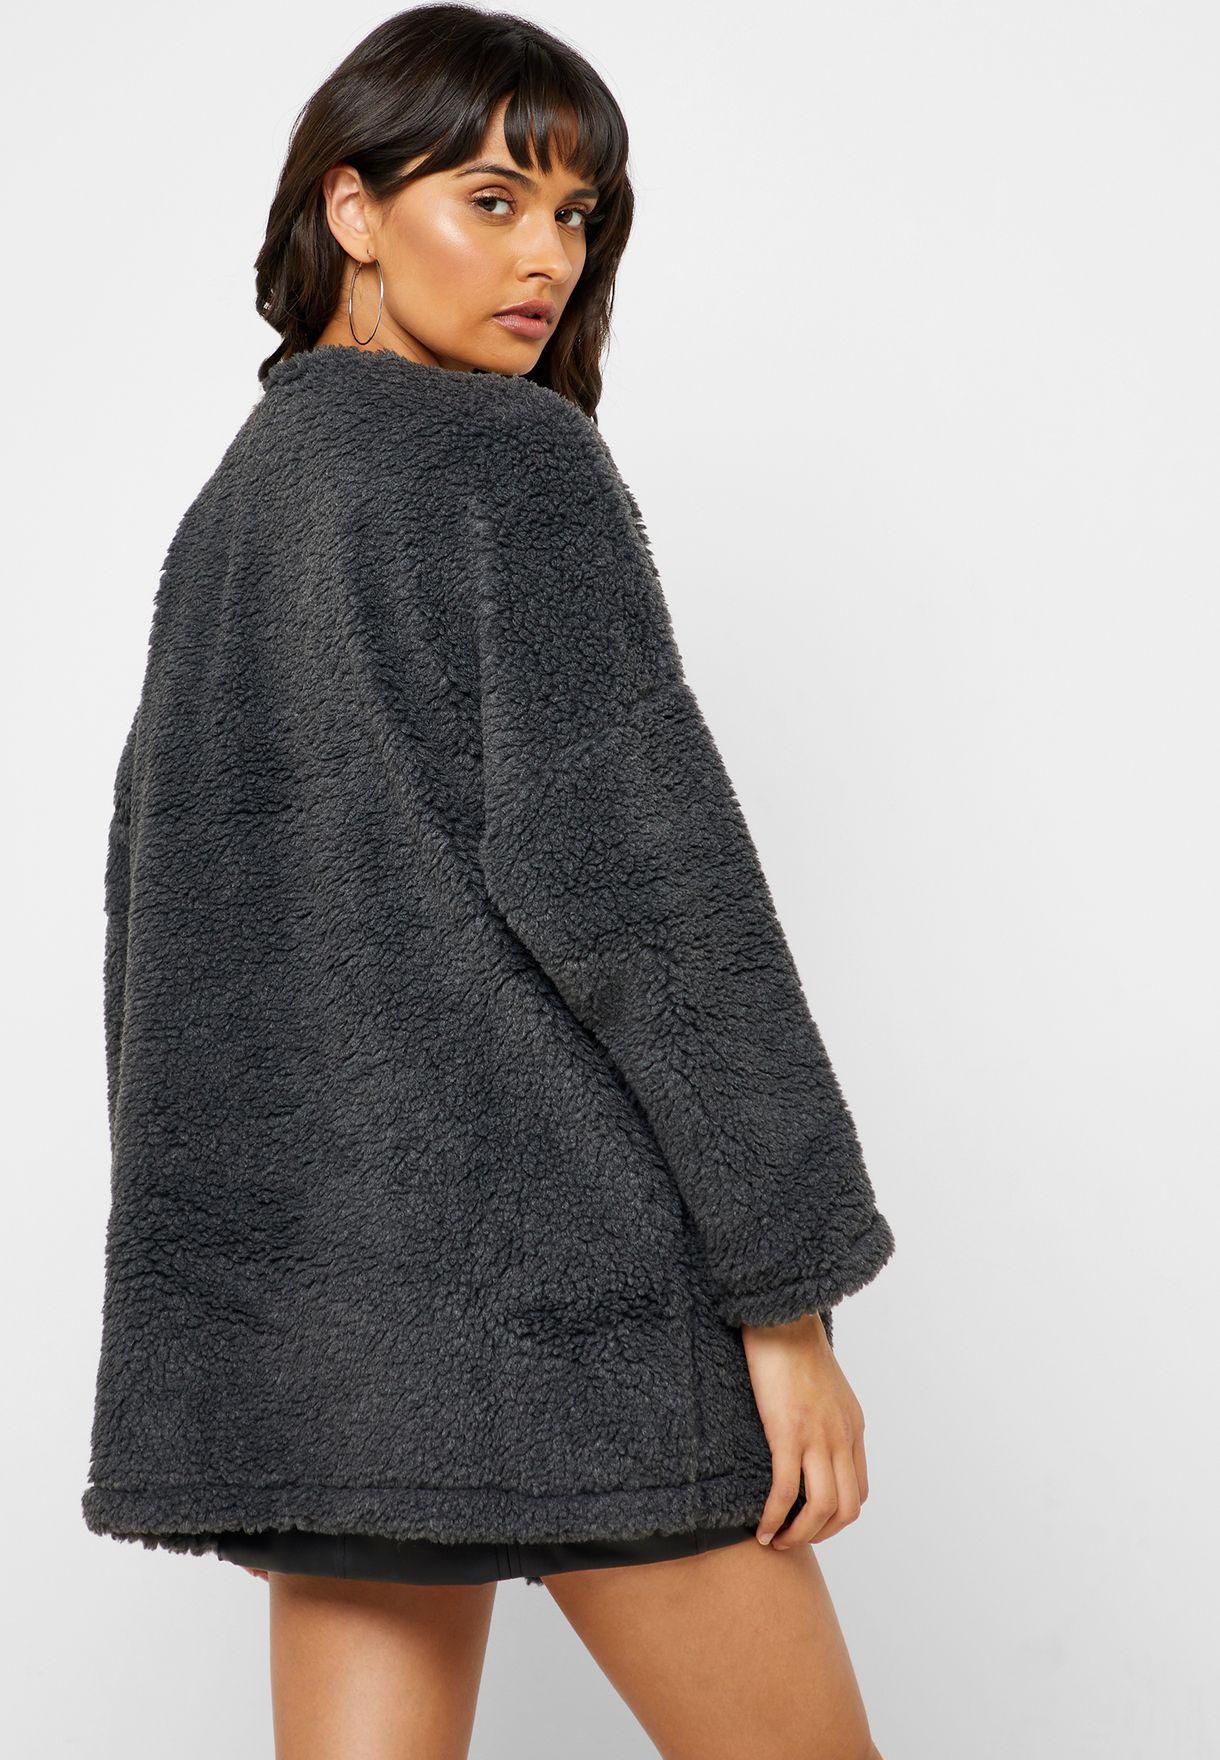 Throwover Teddy Coat